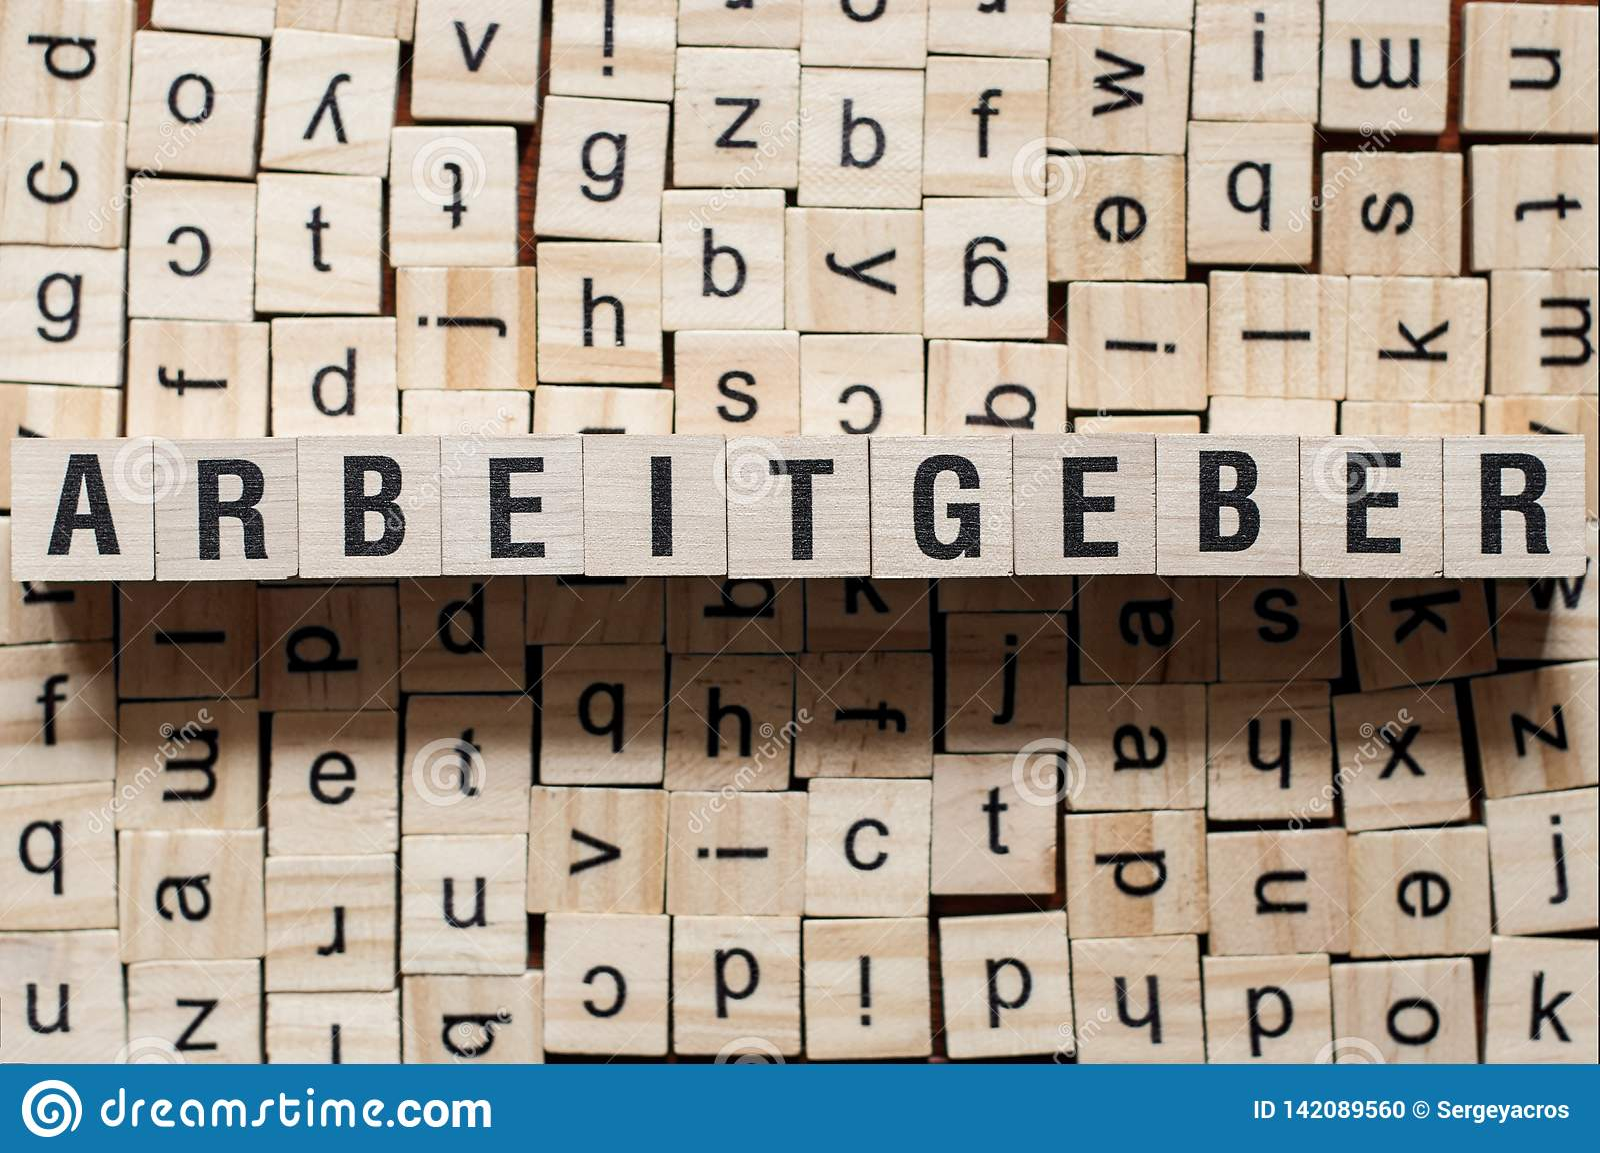 Arbeitgeber - word Employer on german language,word concept